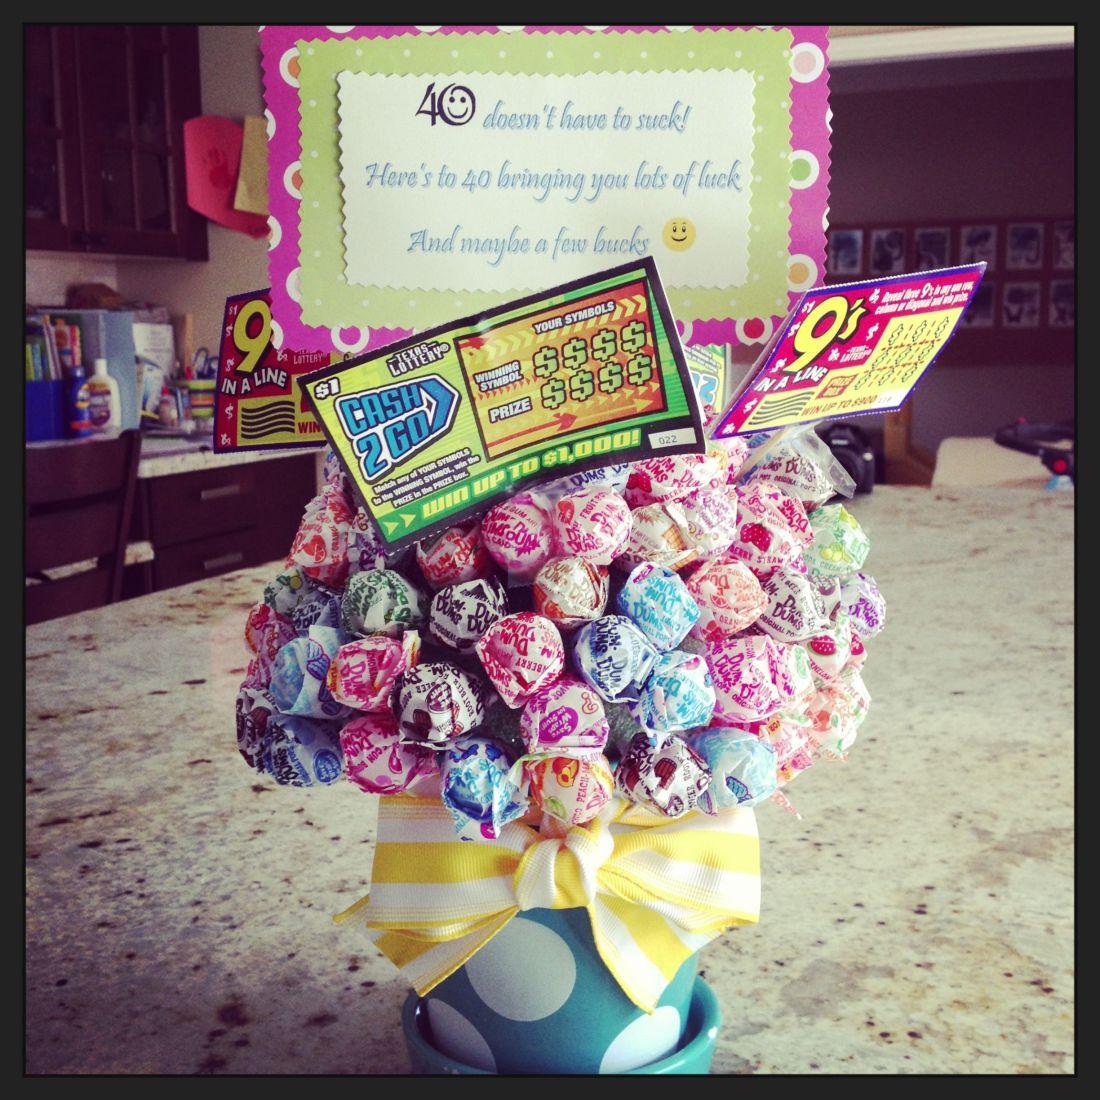 40th birthday gift sucker bouquet with lotto tickets